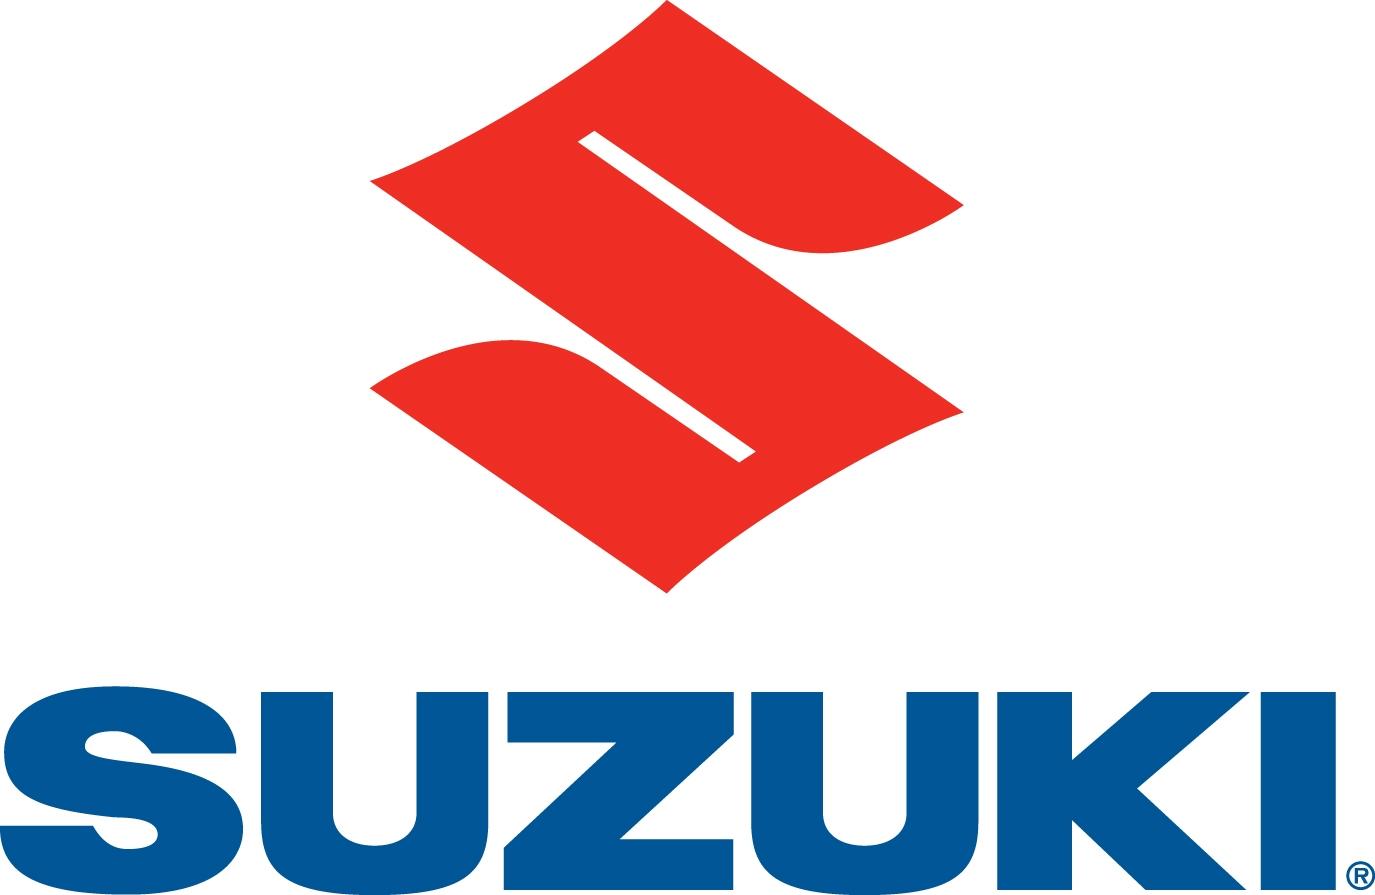 suzuki logo hero